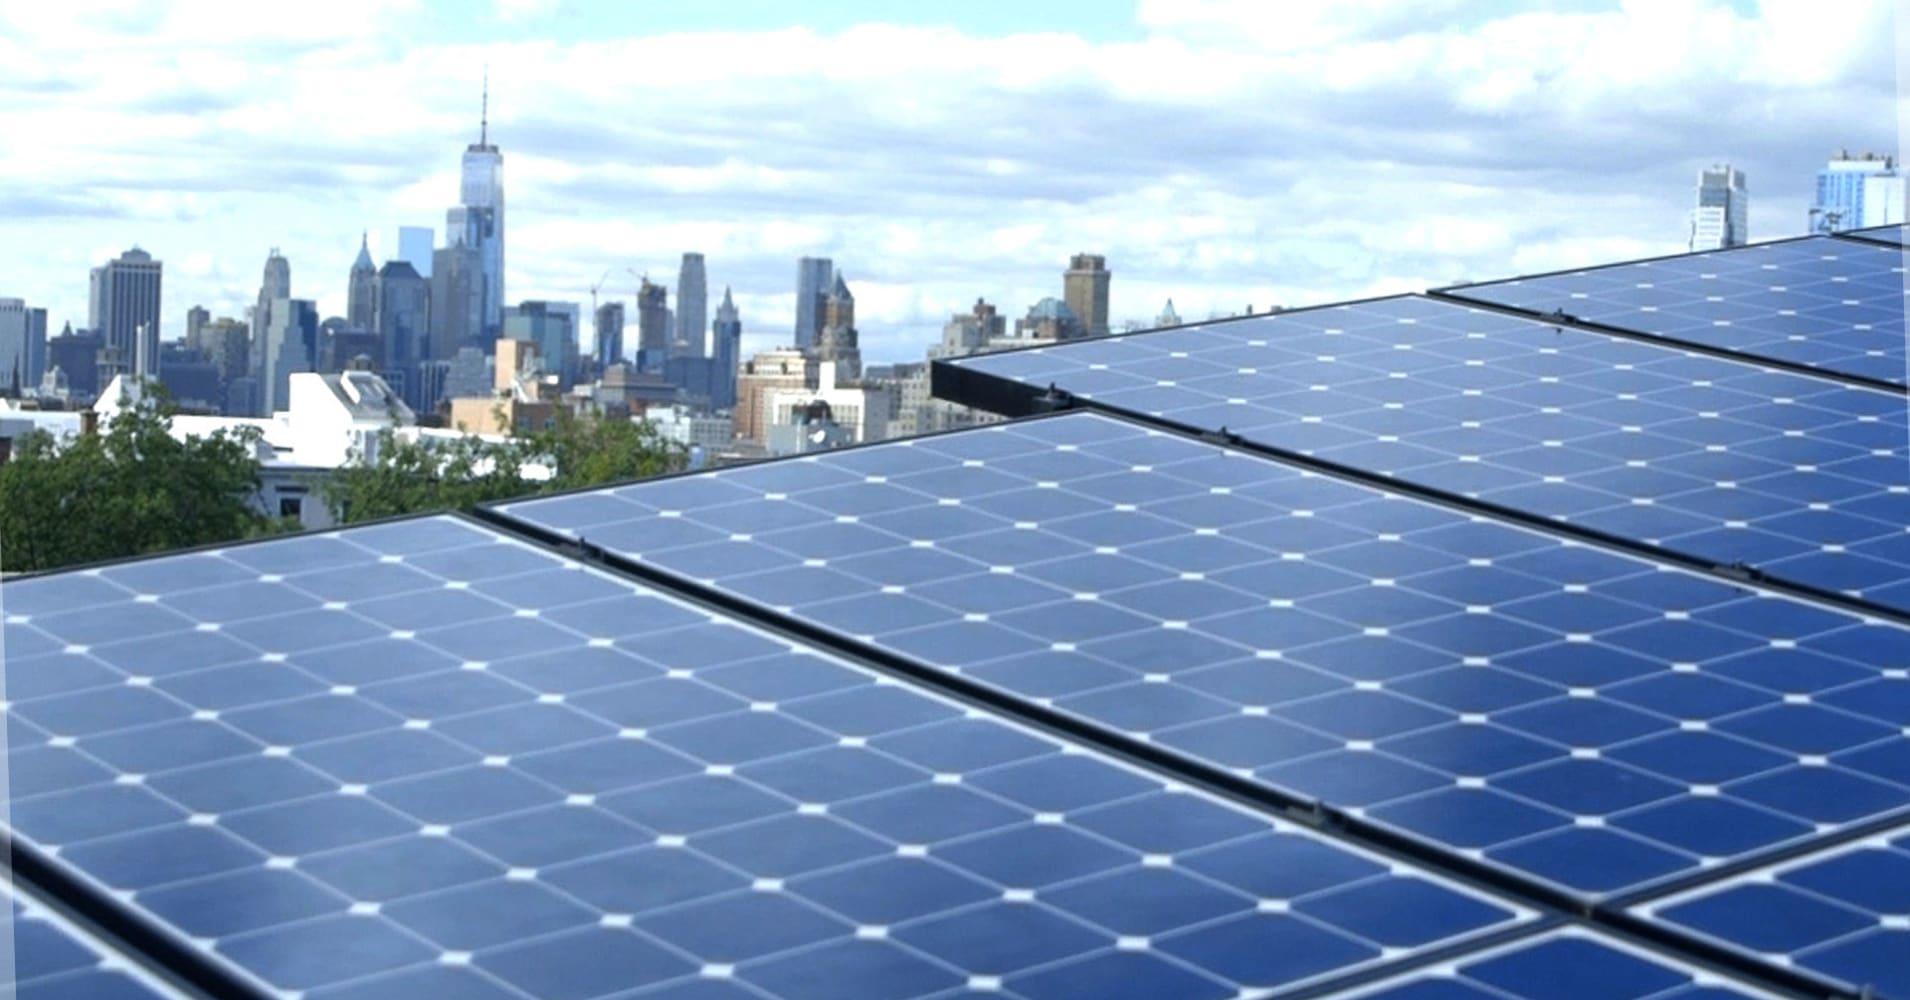 Waaree Energies expando solar pv mfg capacity